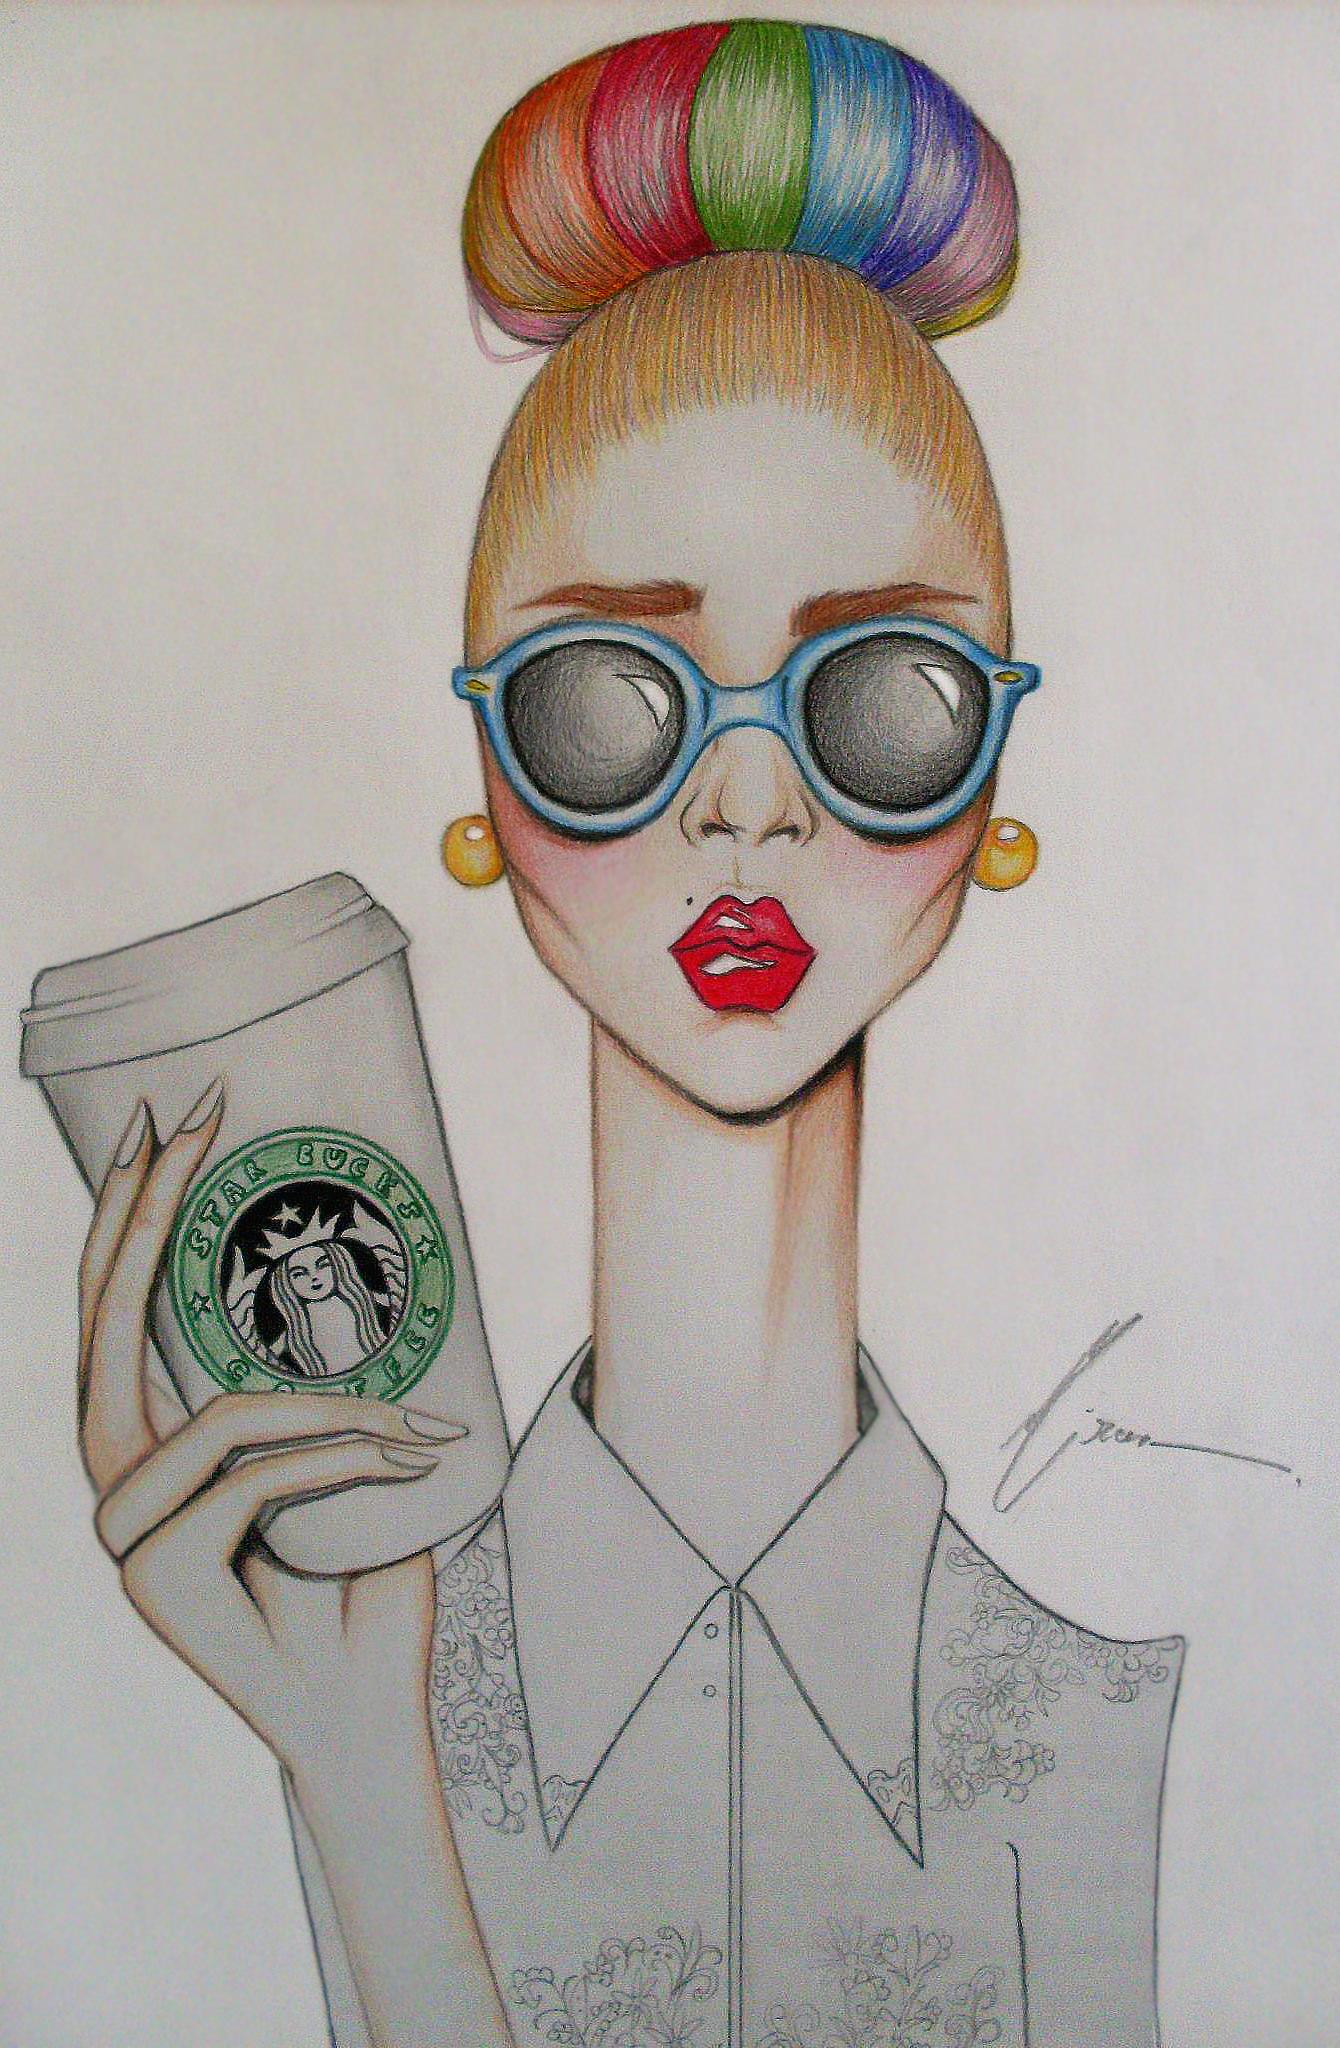 Drawn coffee Coffee cute art Haha Haha